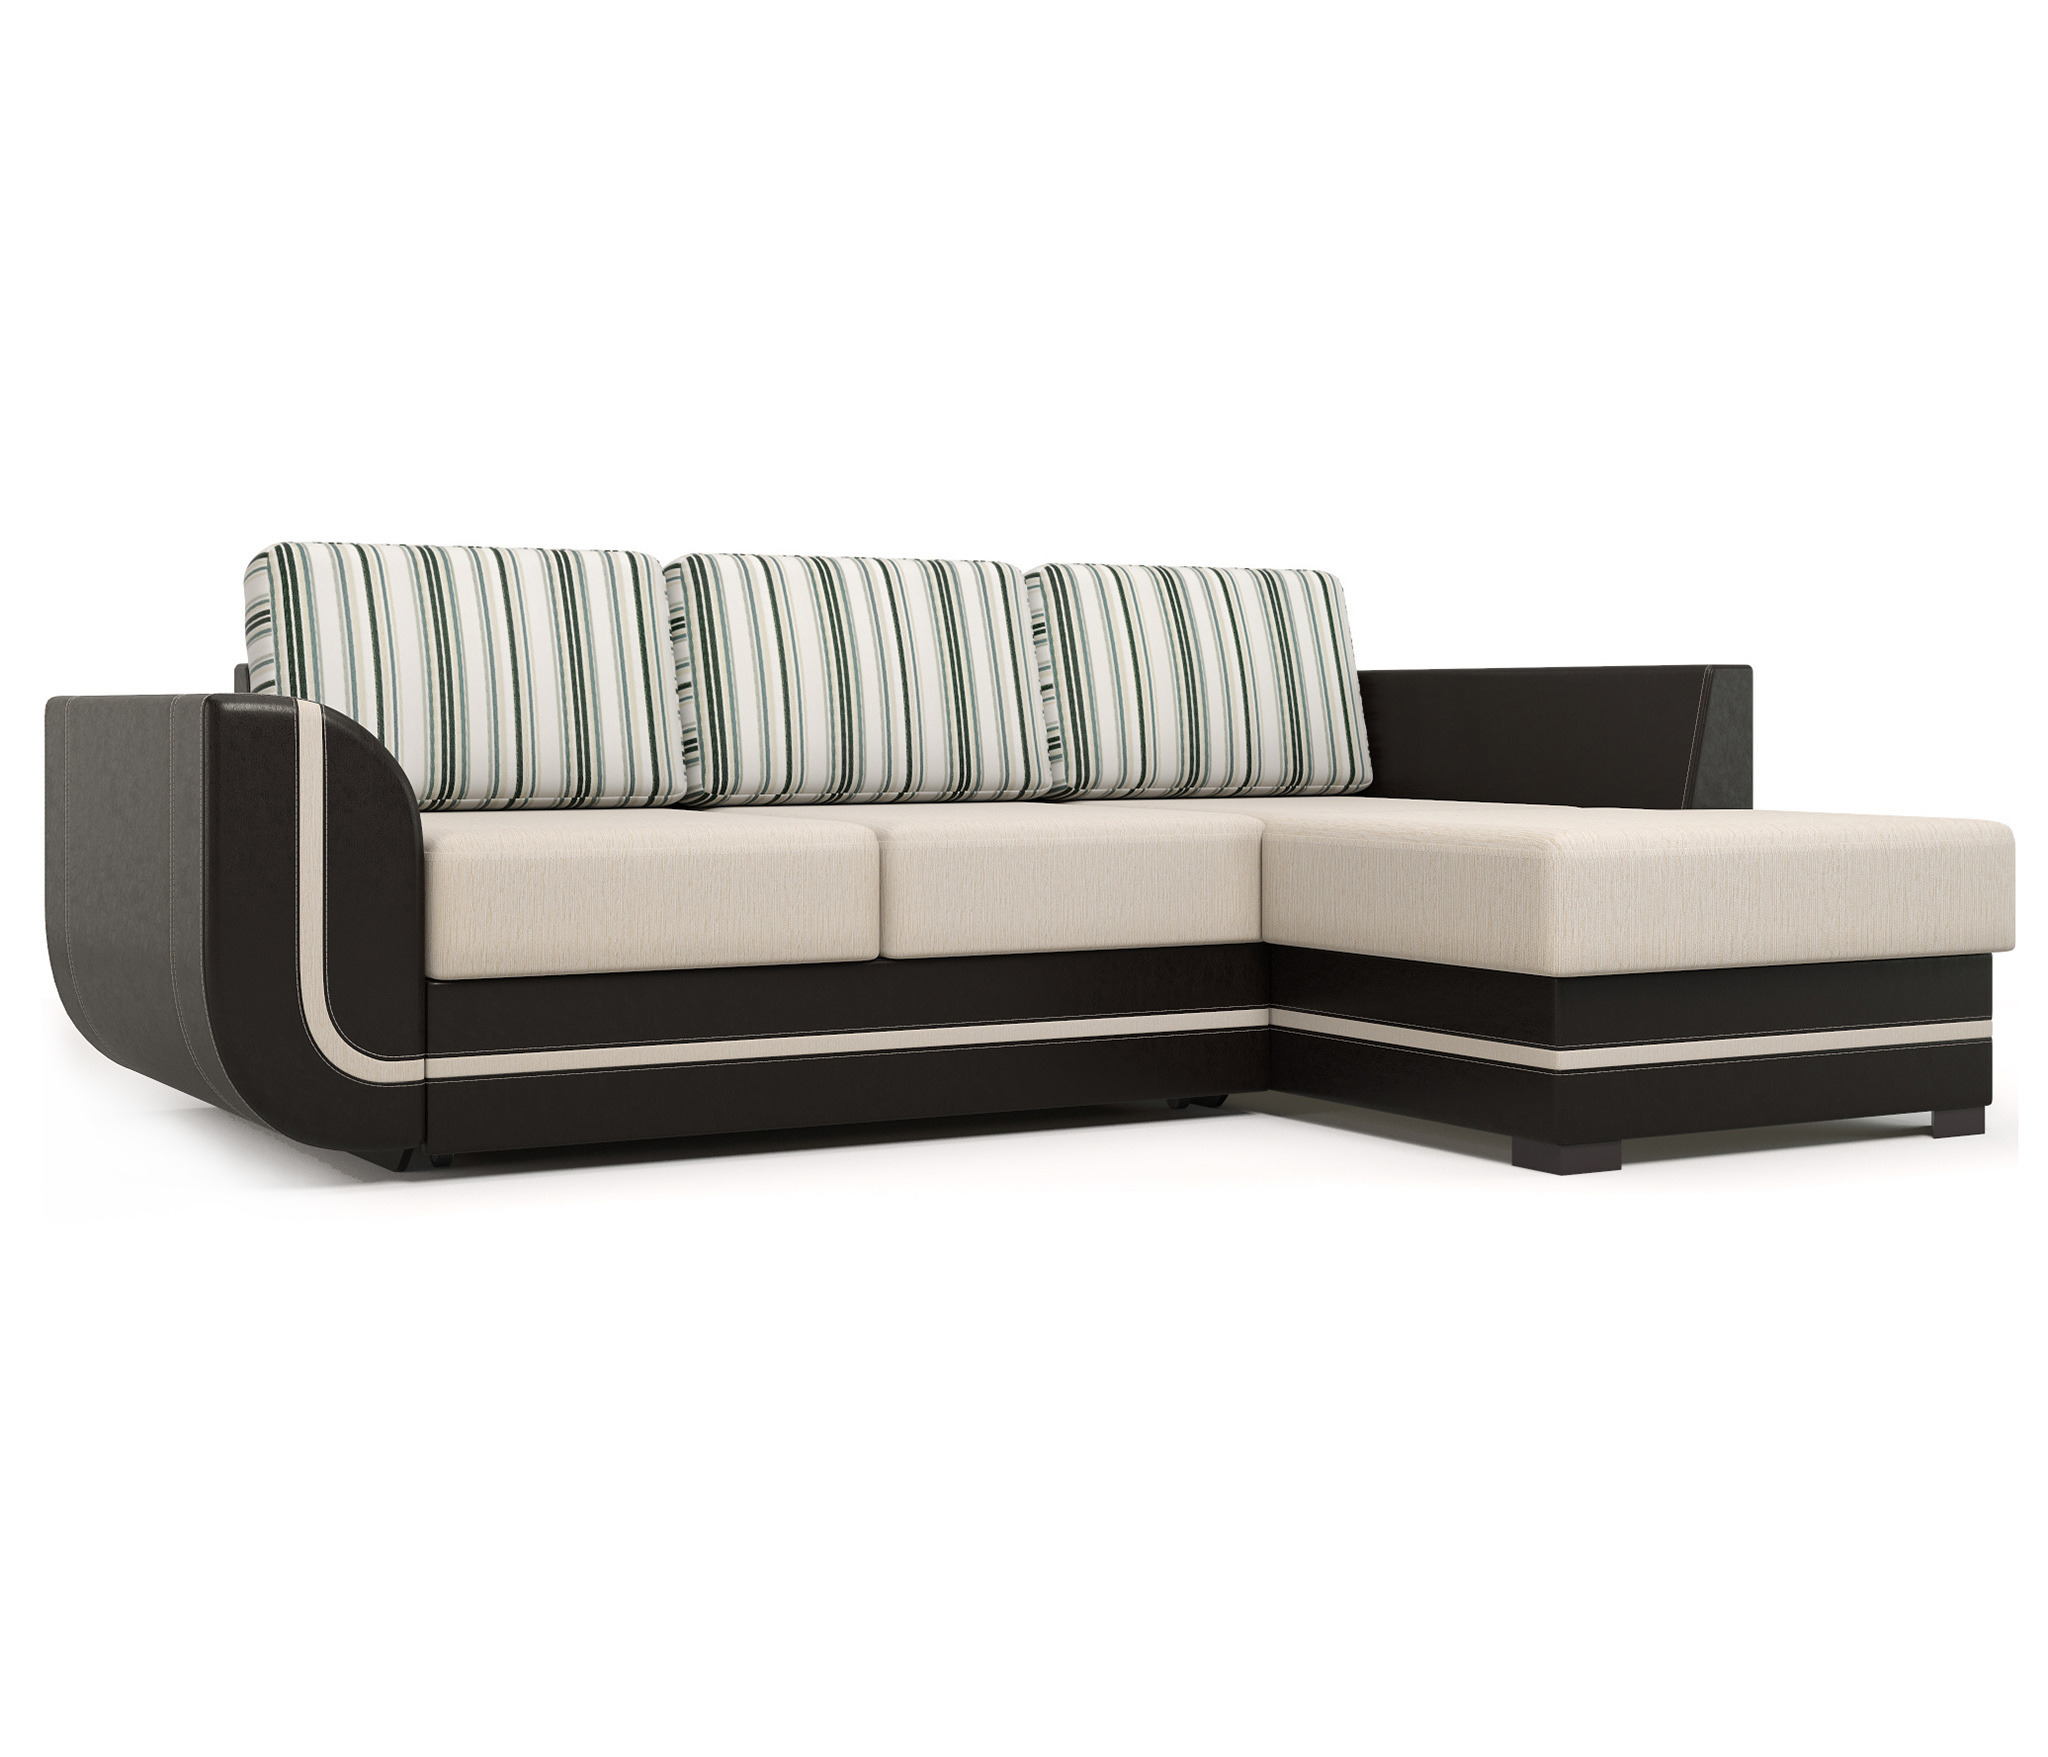 Угловой диван Чикаго 1(правый)Мягкая мебель<br><br><br>Длина мм: 2360<br>Высота мм: 670<br>Глубина мм: 1590